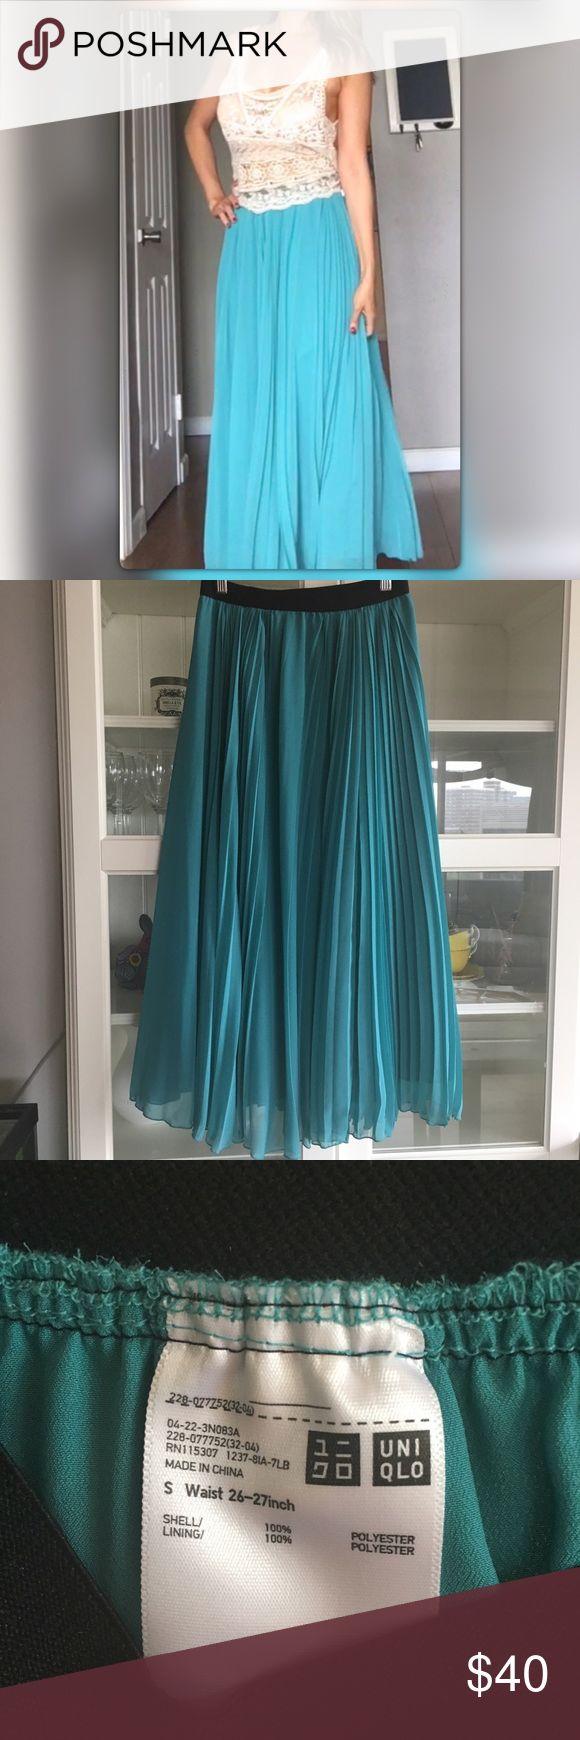 Romantic pleated aqua maxi skirt uniqlo Breezy pleated chiffon-like maxi skirt.  Elastic waist and slip on. Romantic and boho. Ultra easy style. Like new. No trades please. Uniqlo Dresses Maxi